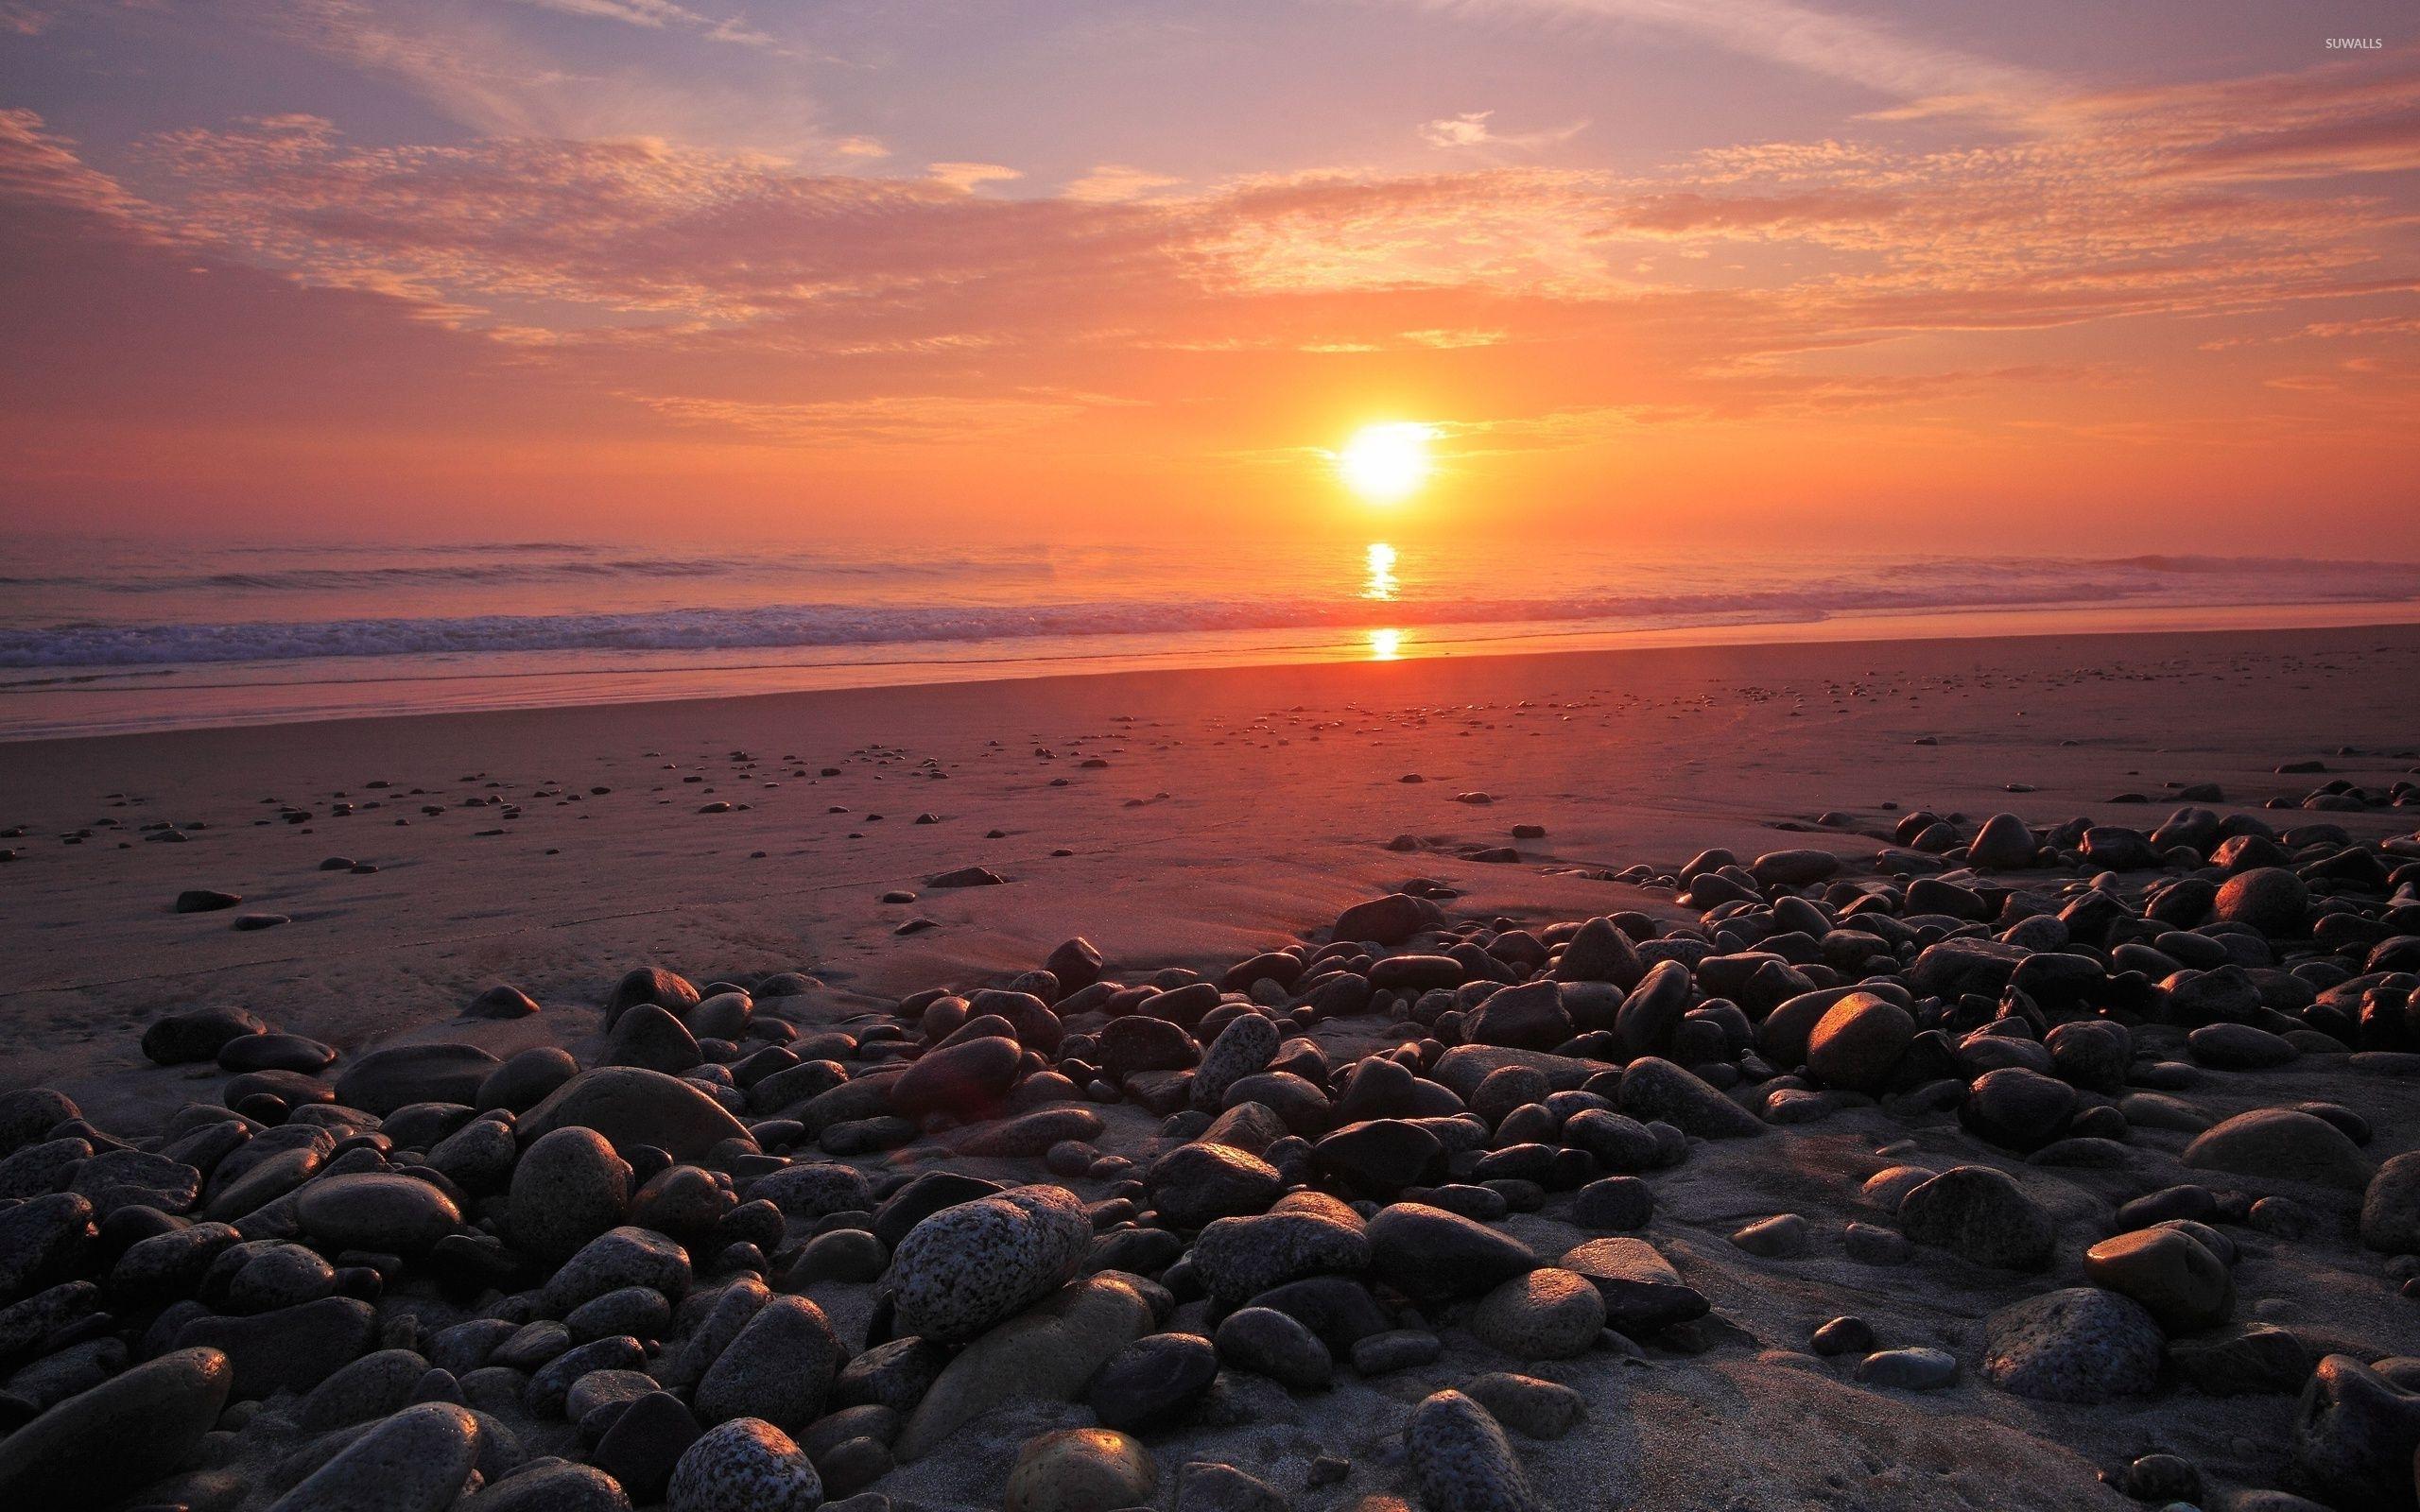 sunset over the ocean wallpaper - beach wallpapers - #33117